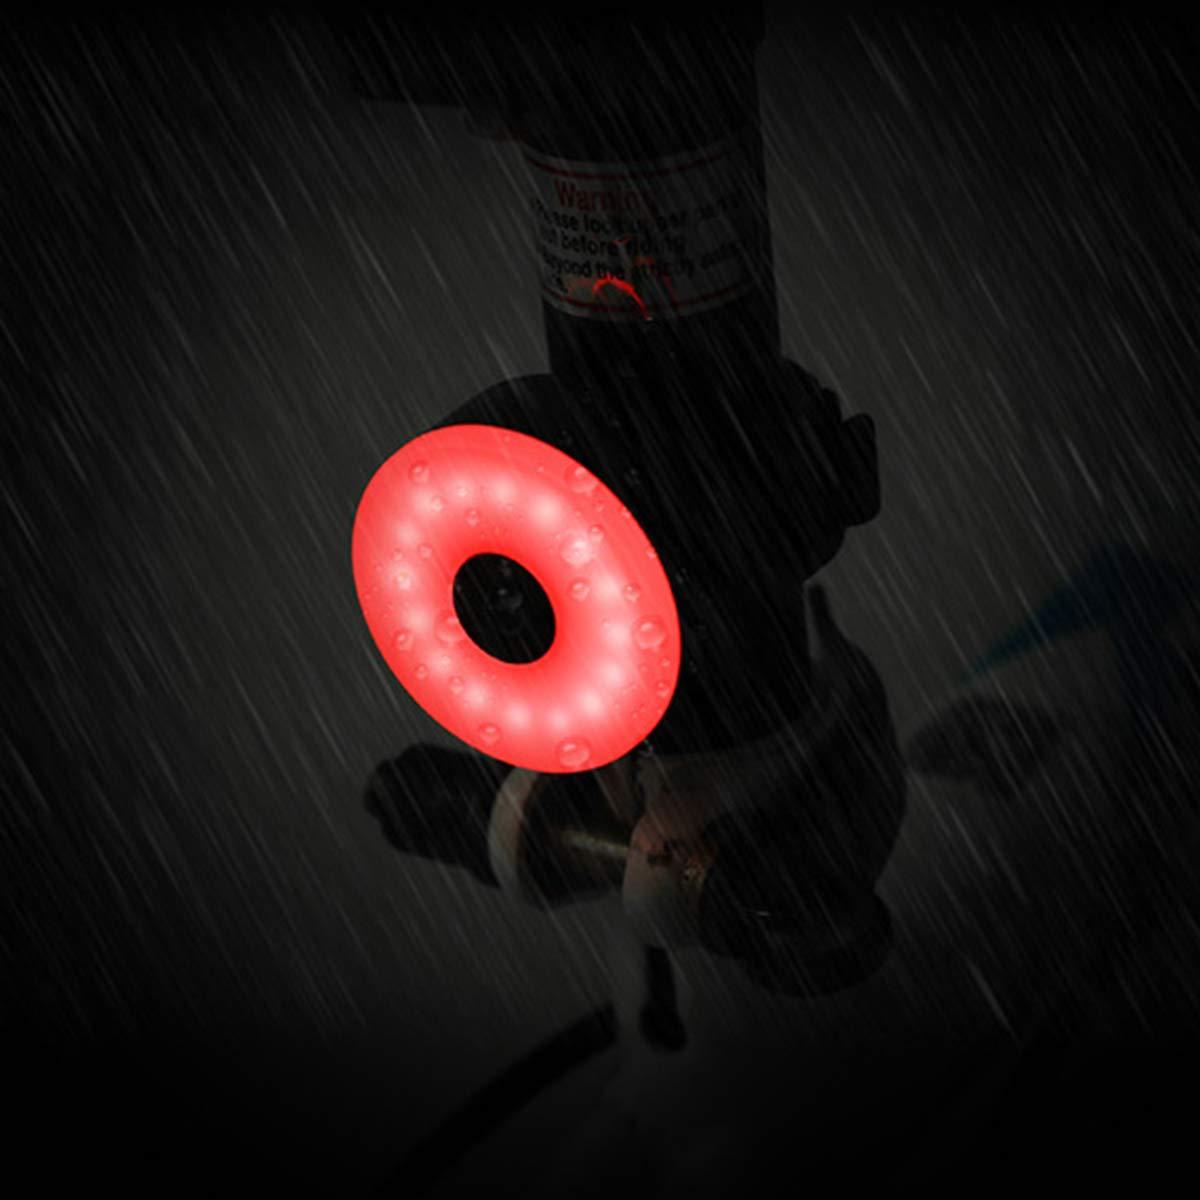 Recargable por USB Universal luz de Advertencia de Seguridad 5 Modos de luz Ajustable Linterna Trasera para Casco de Bicicleta Impermeable Jinxuny Luz Trasera LED para Bicicleta